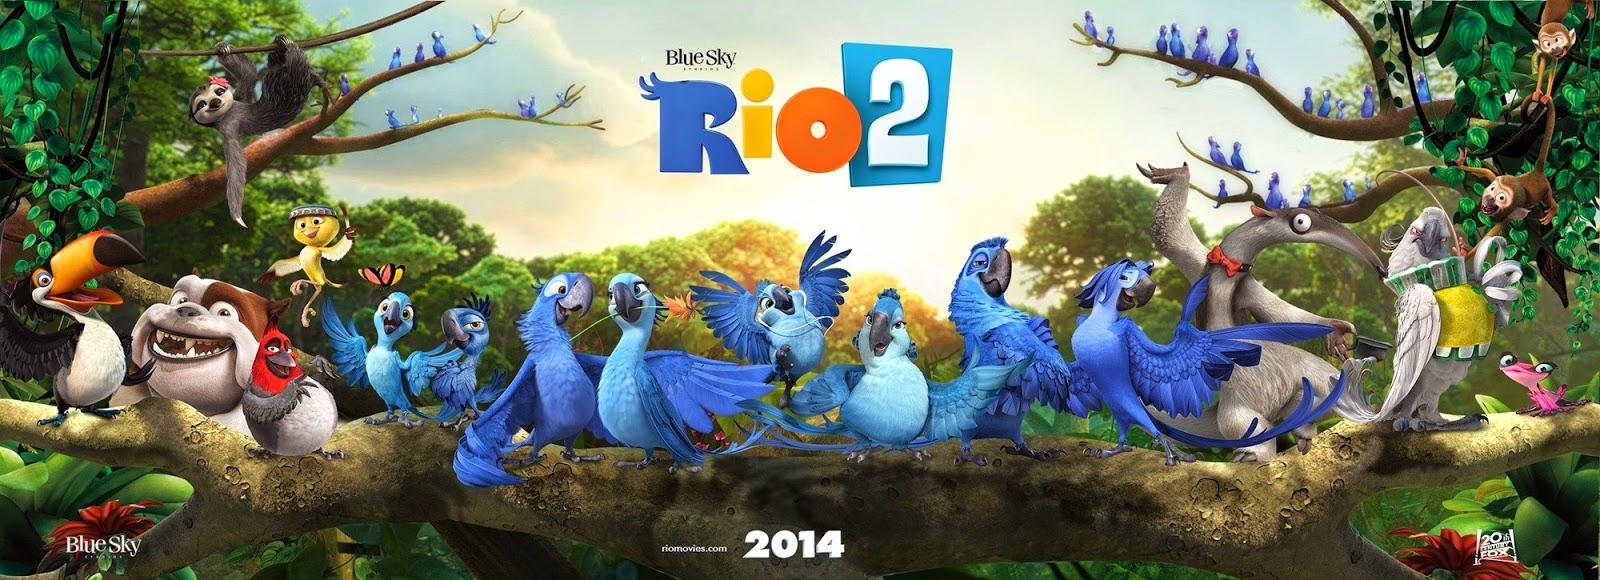 rio 2 free online download